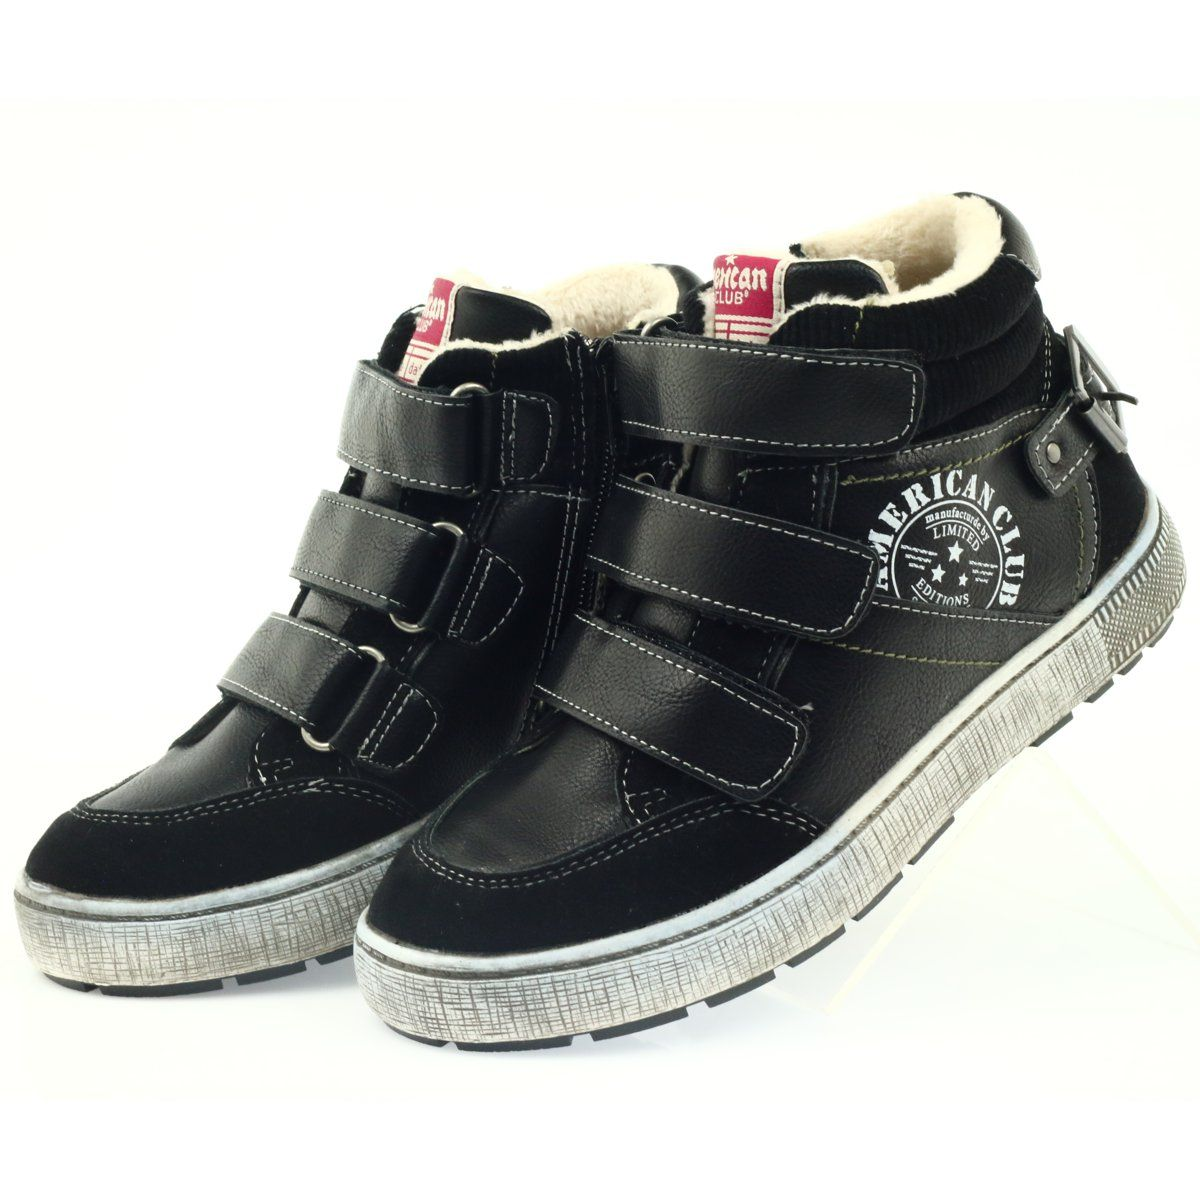 American Club Czarne Trzewiki Sportowe Zimowe 17779 Winter Sport Shoes Sports Shoes Shoes